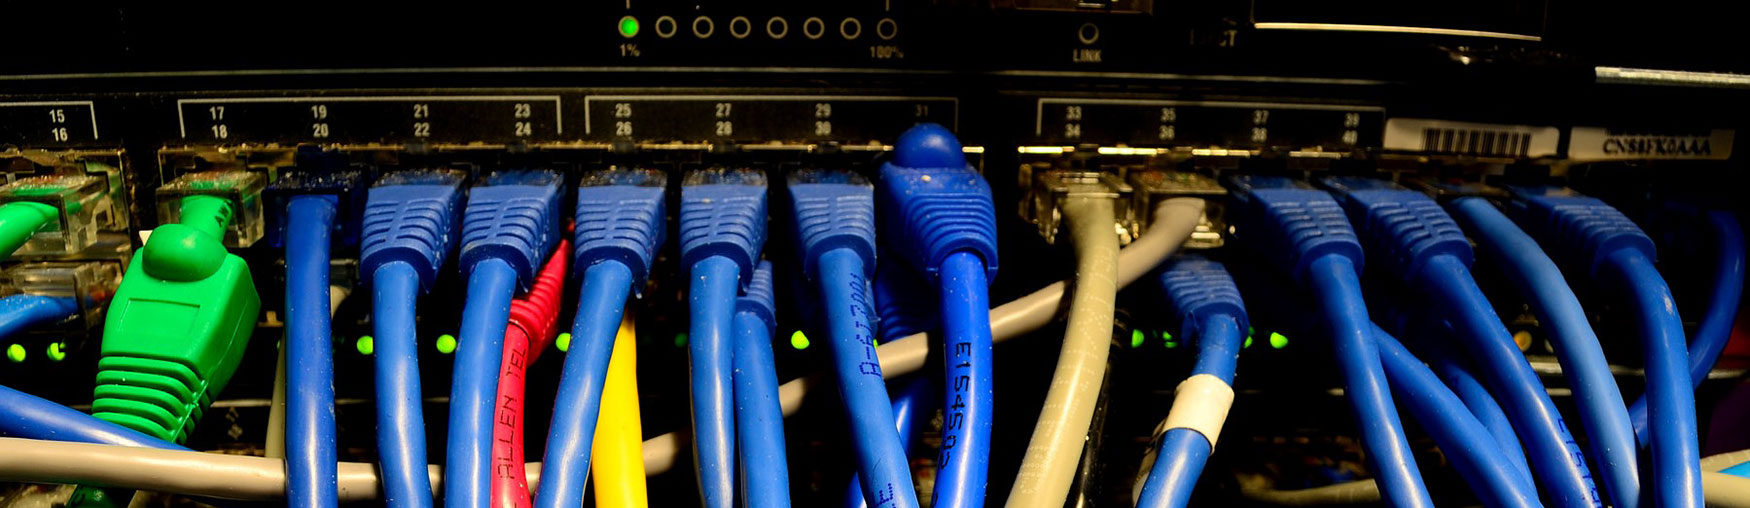 ethernet-header.jpg